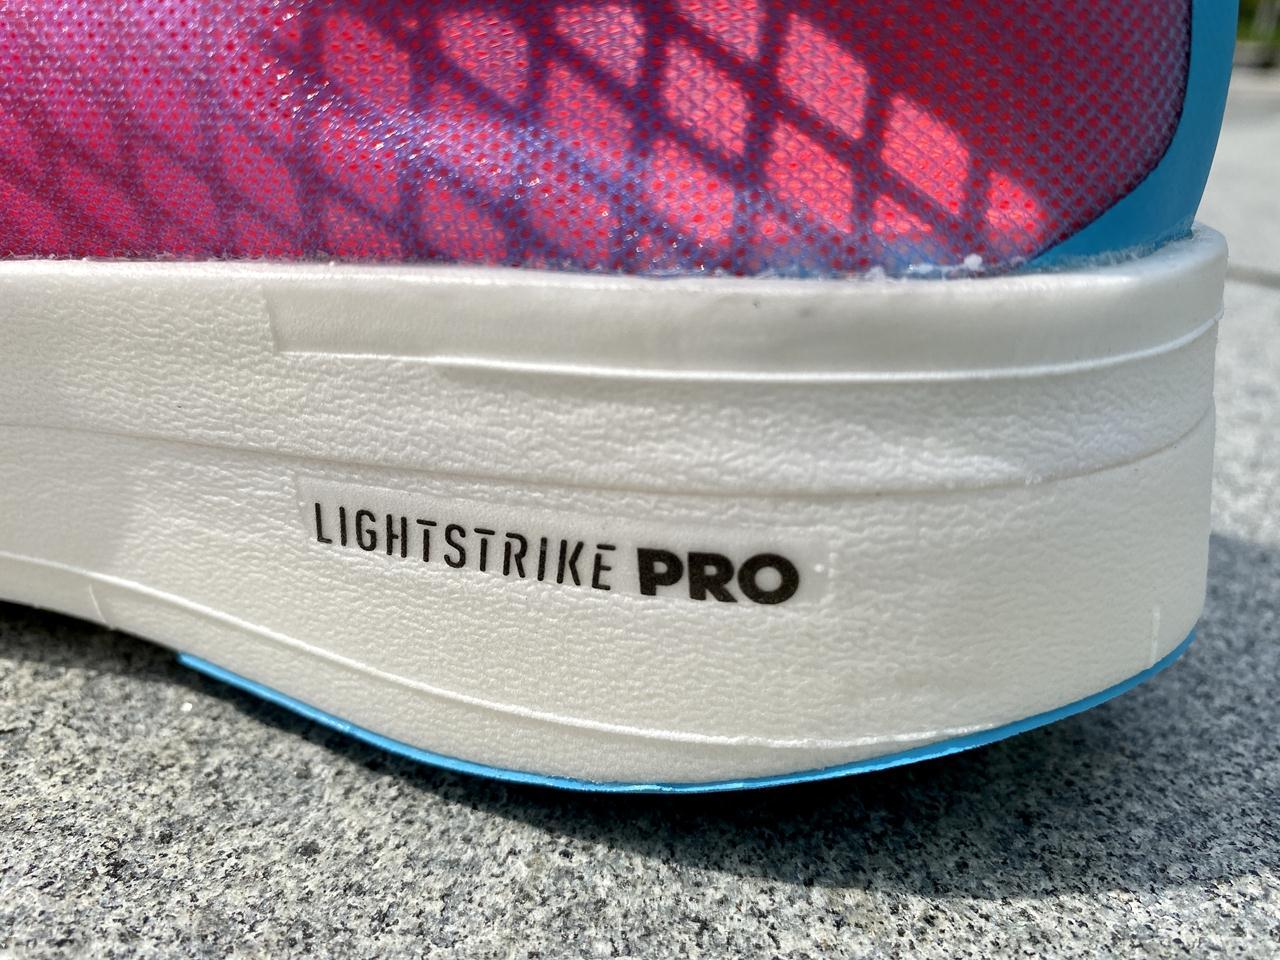 Adidas Adizero Adios Pro - Closeup-Lateral Side